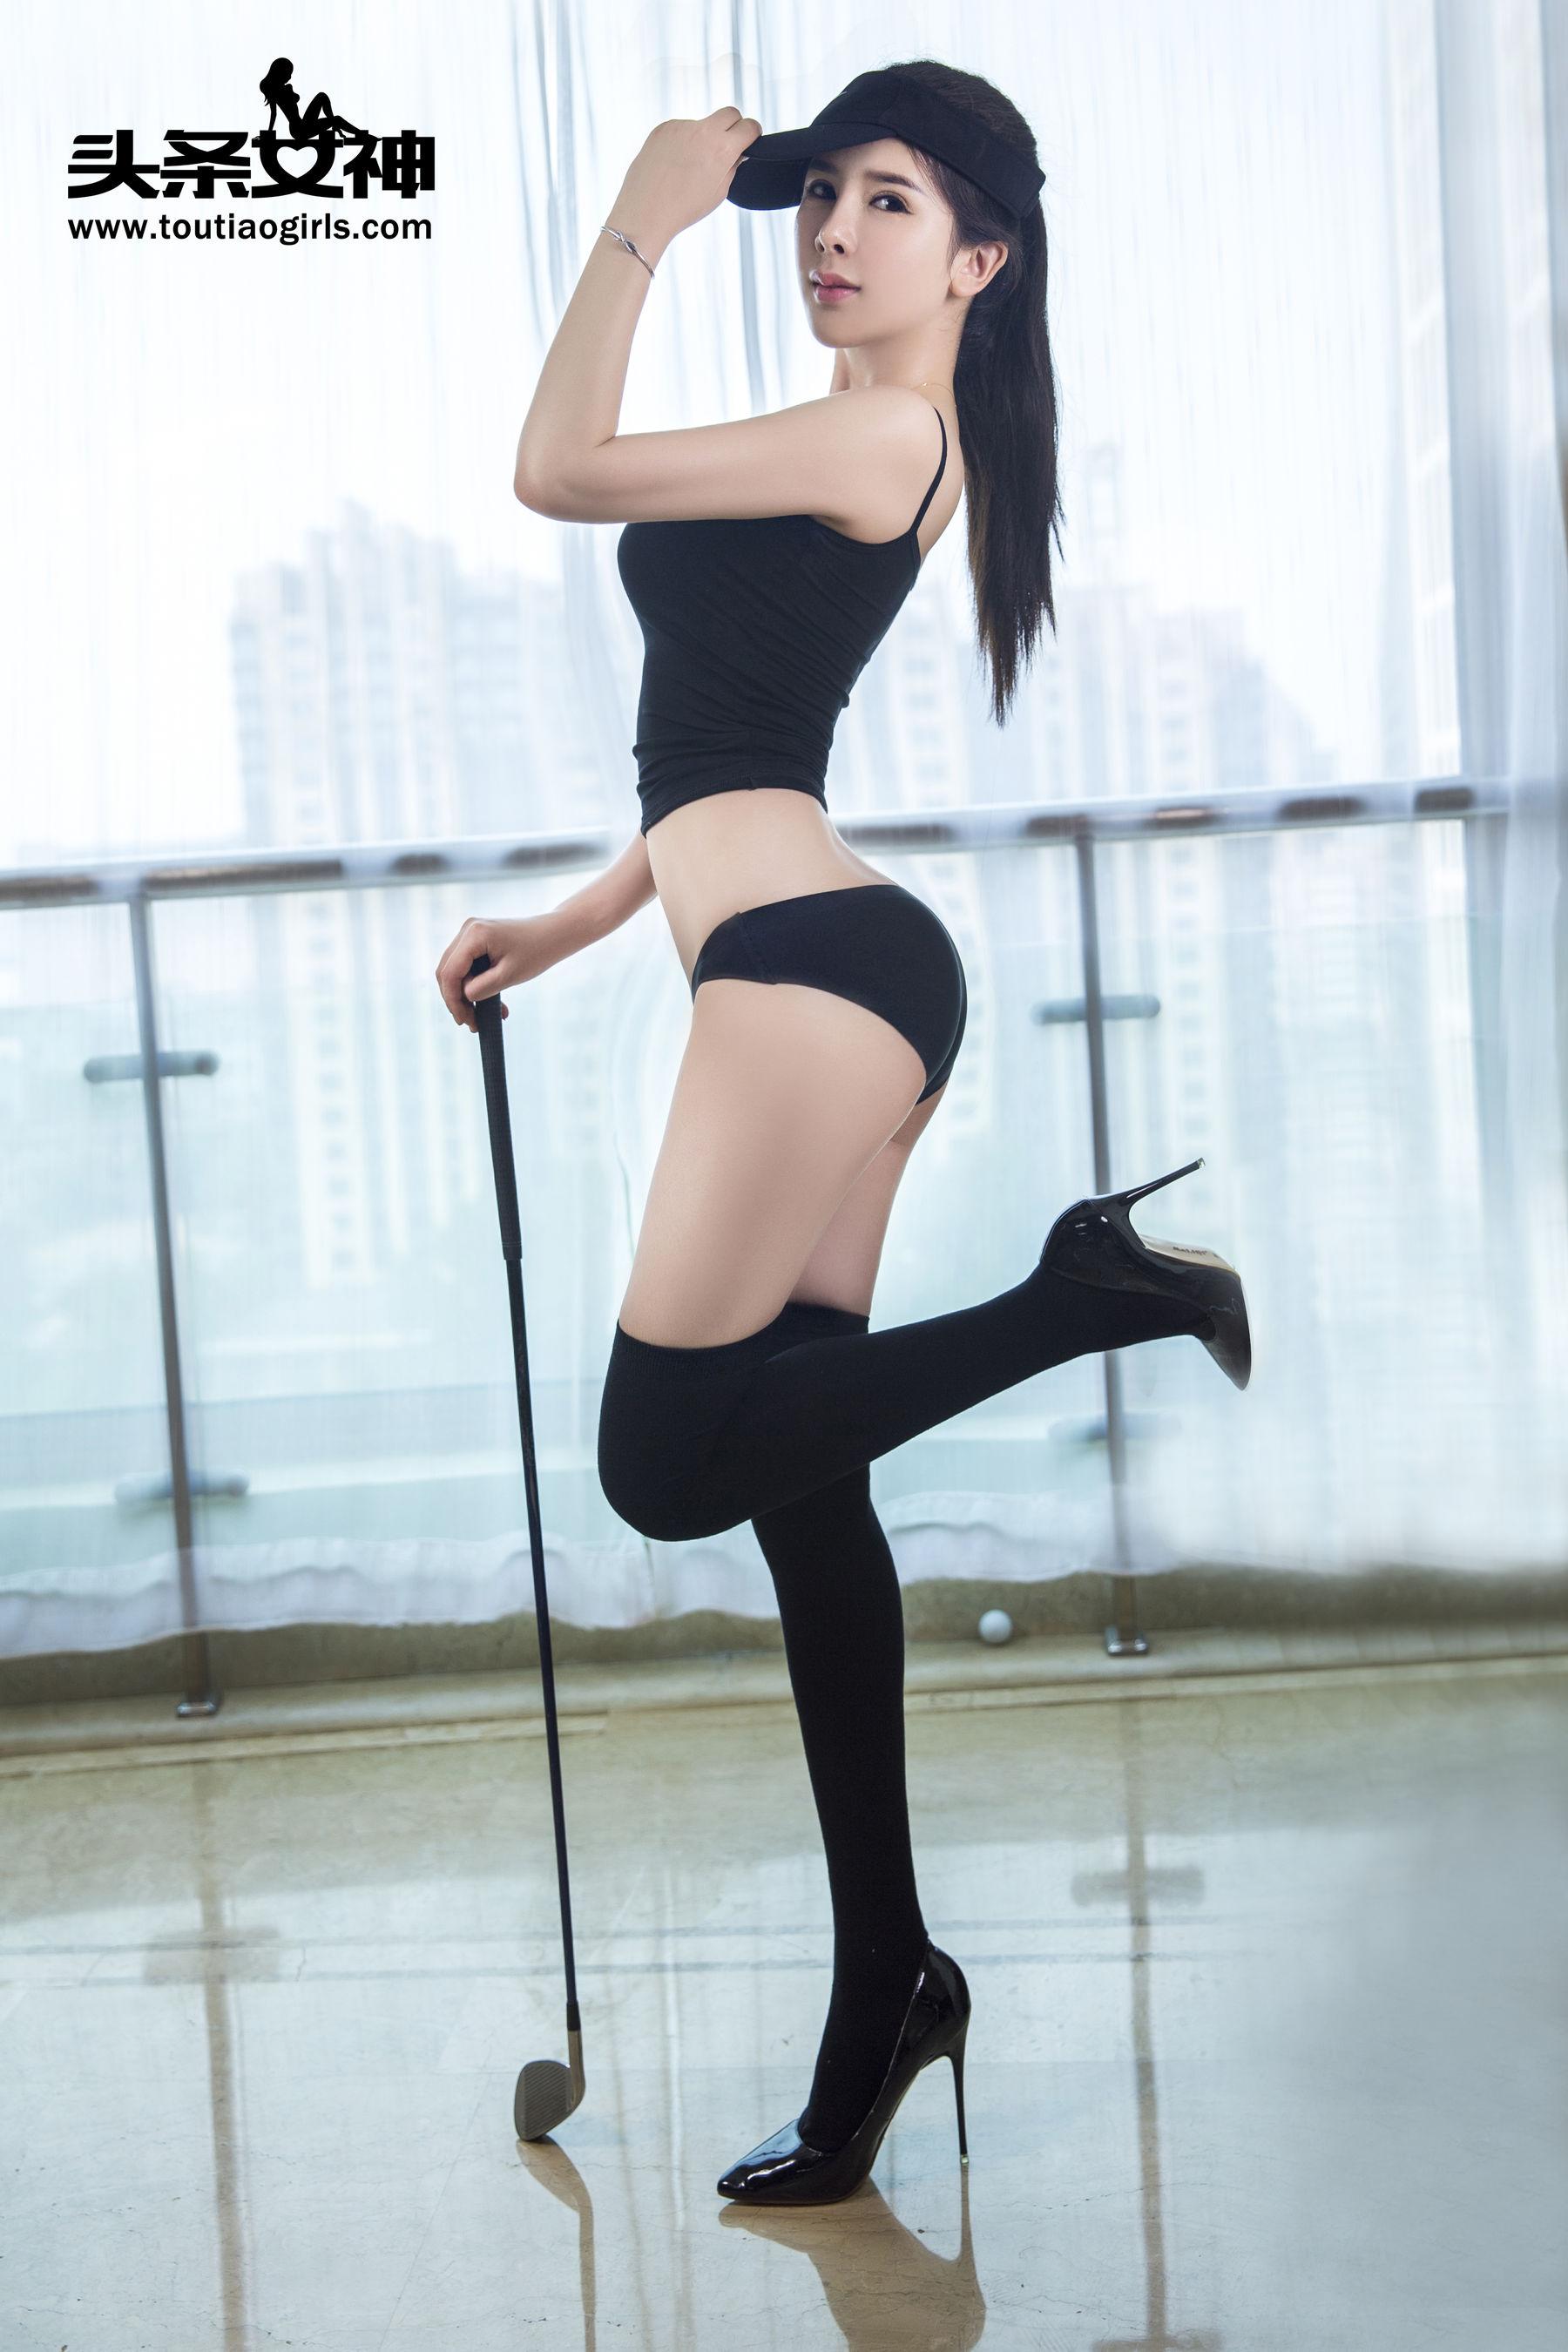 VOL.184 [头条女神]长筒袜运动装时尚美女网红背心:李丽莎(推女郎李丽莎)超高清写真套图(14P)